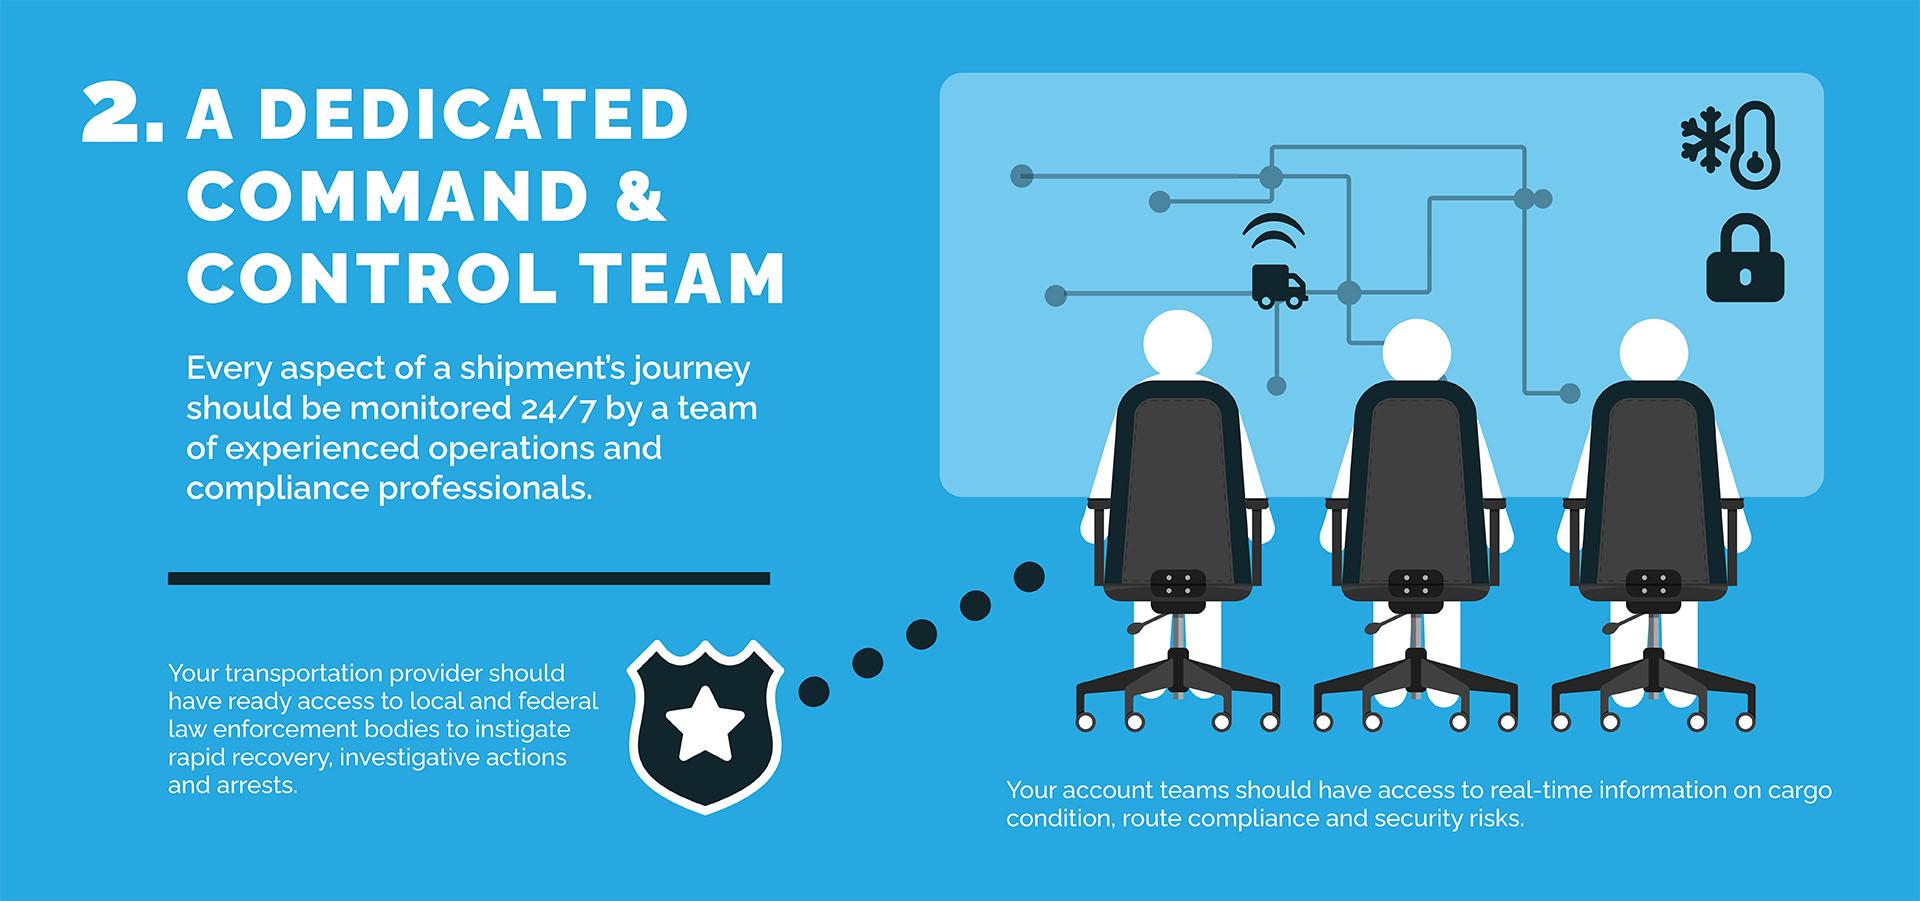 A Dedicated Command & Control Team